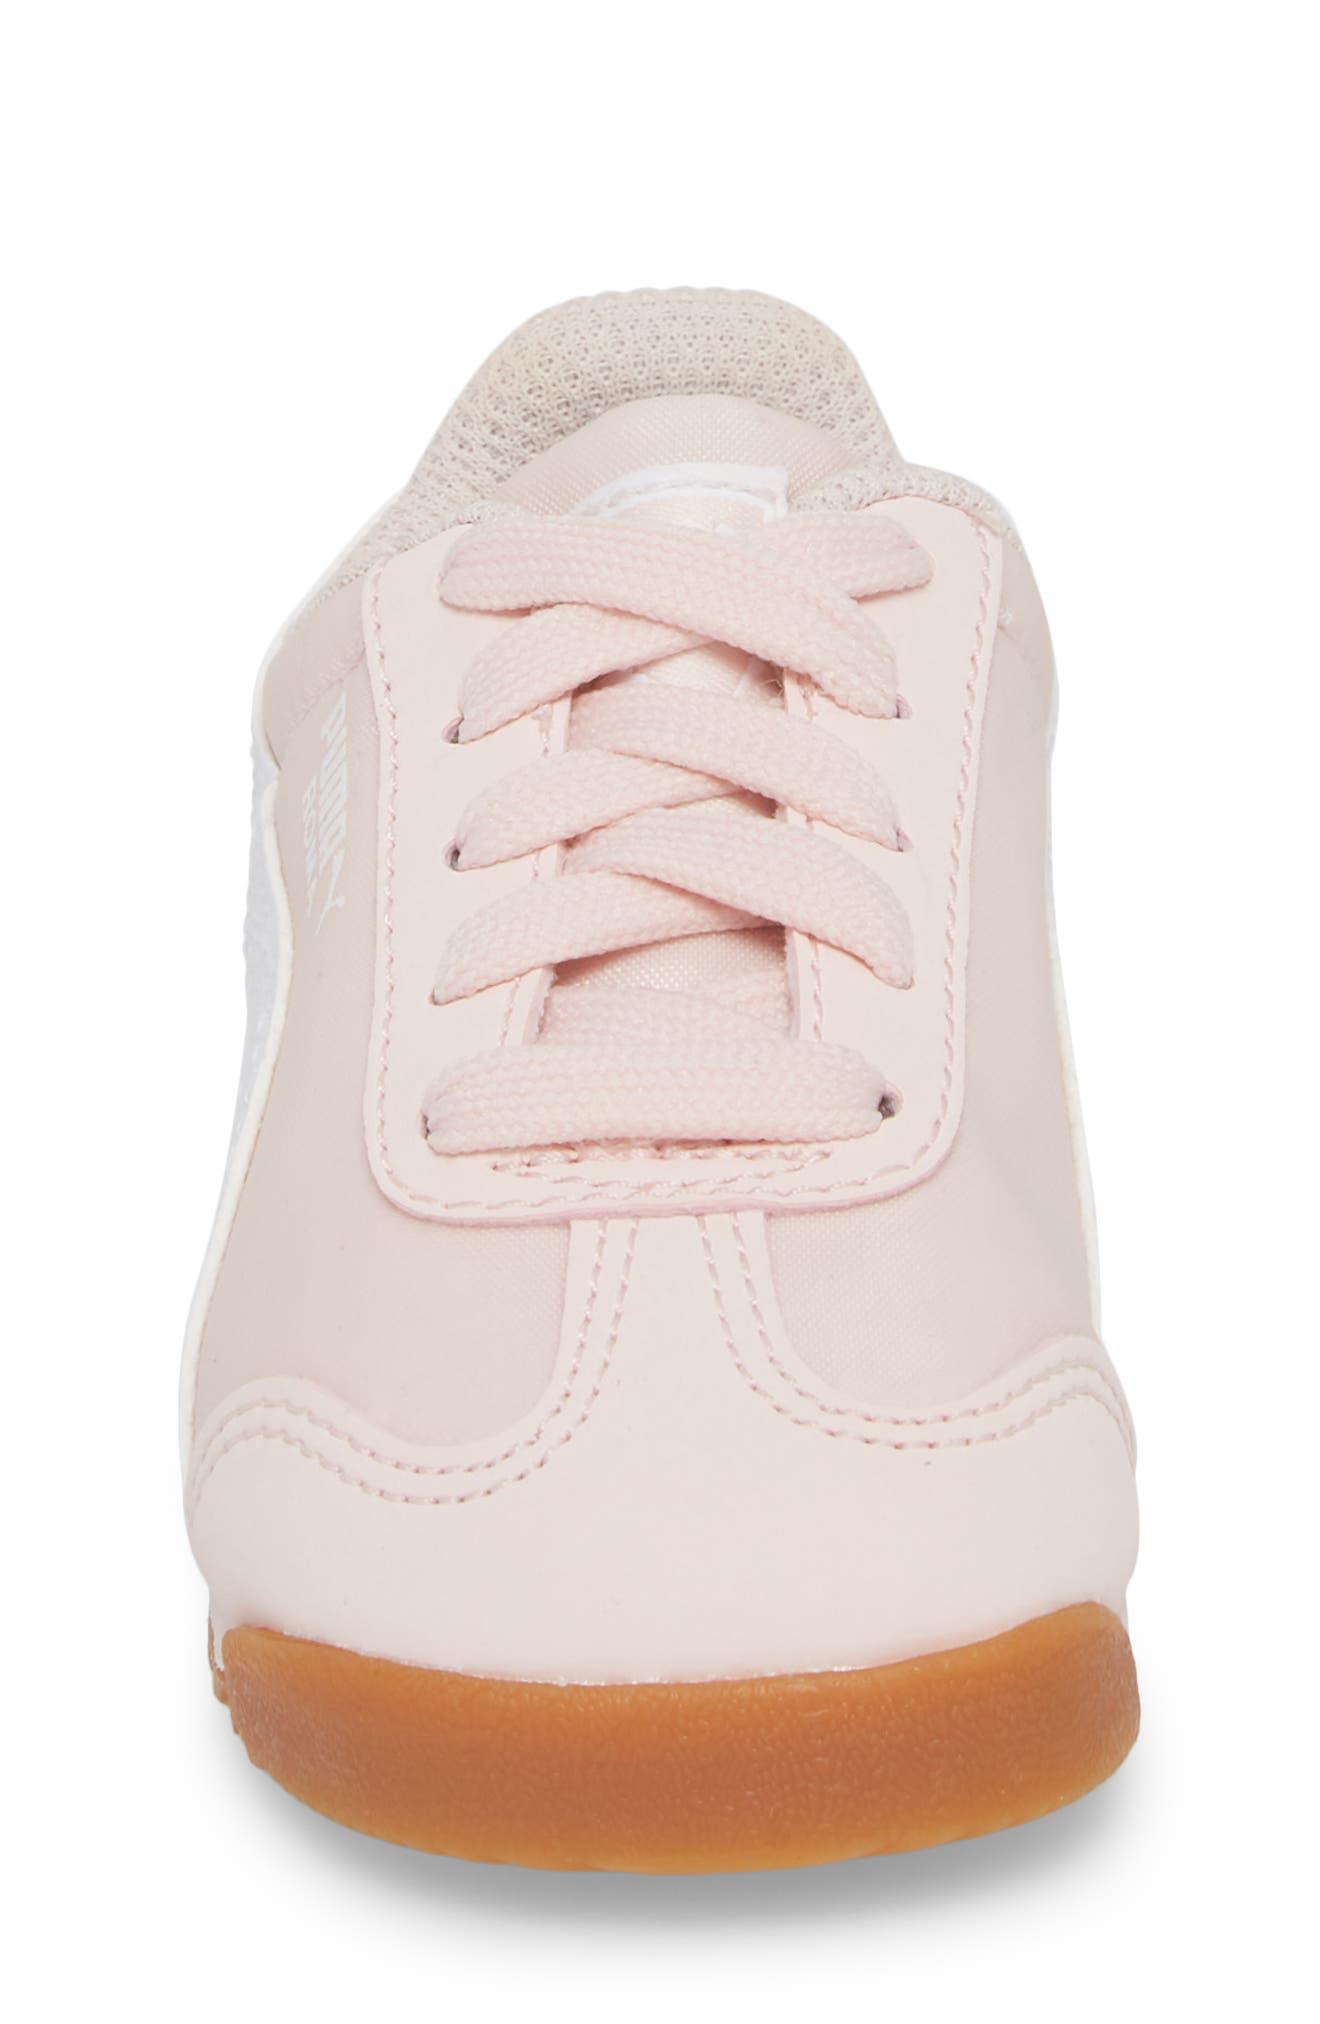 PUMA,                             Roma Basic Summer Sneaker,                             Alternate thumbnail 4, color,                             100